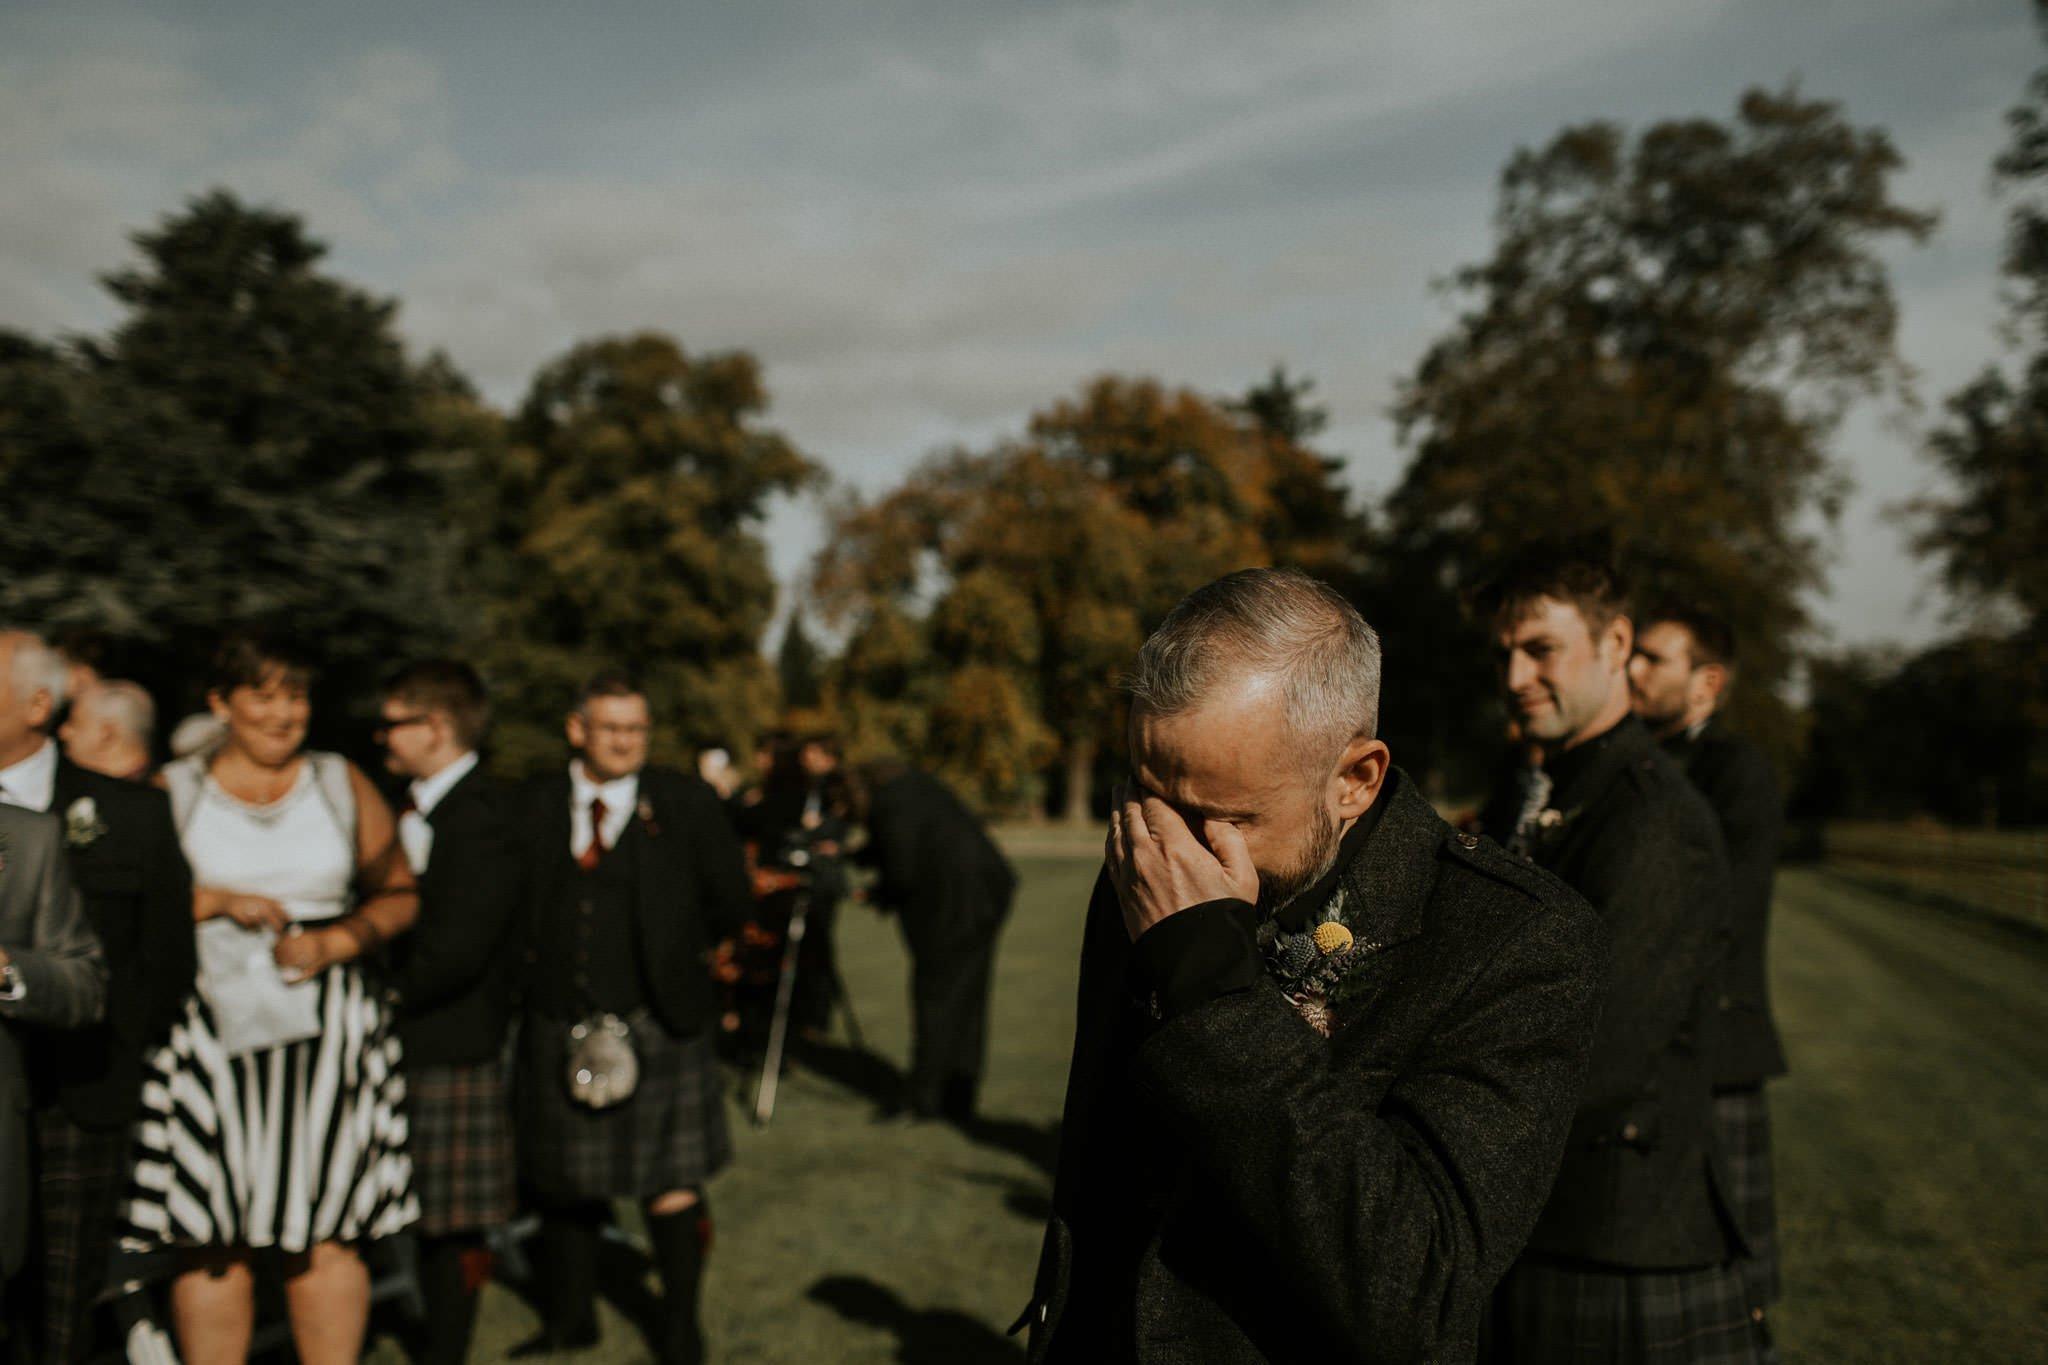 fine-art-wedding-photography-scotland 043